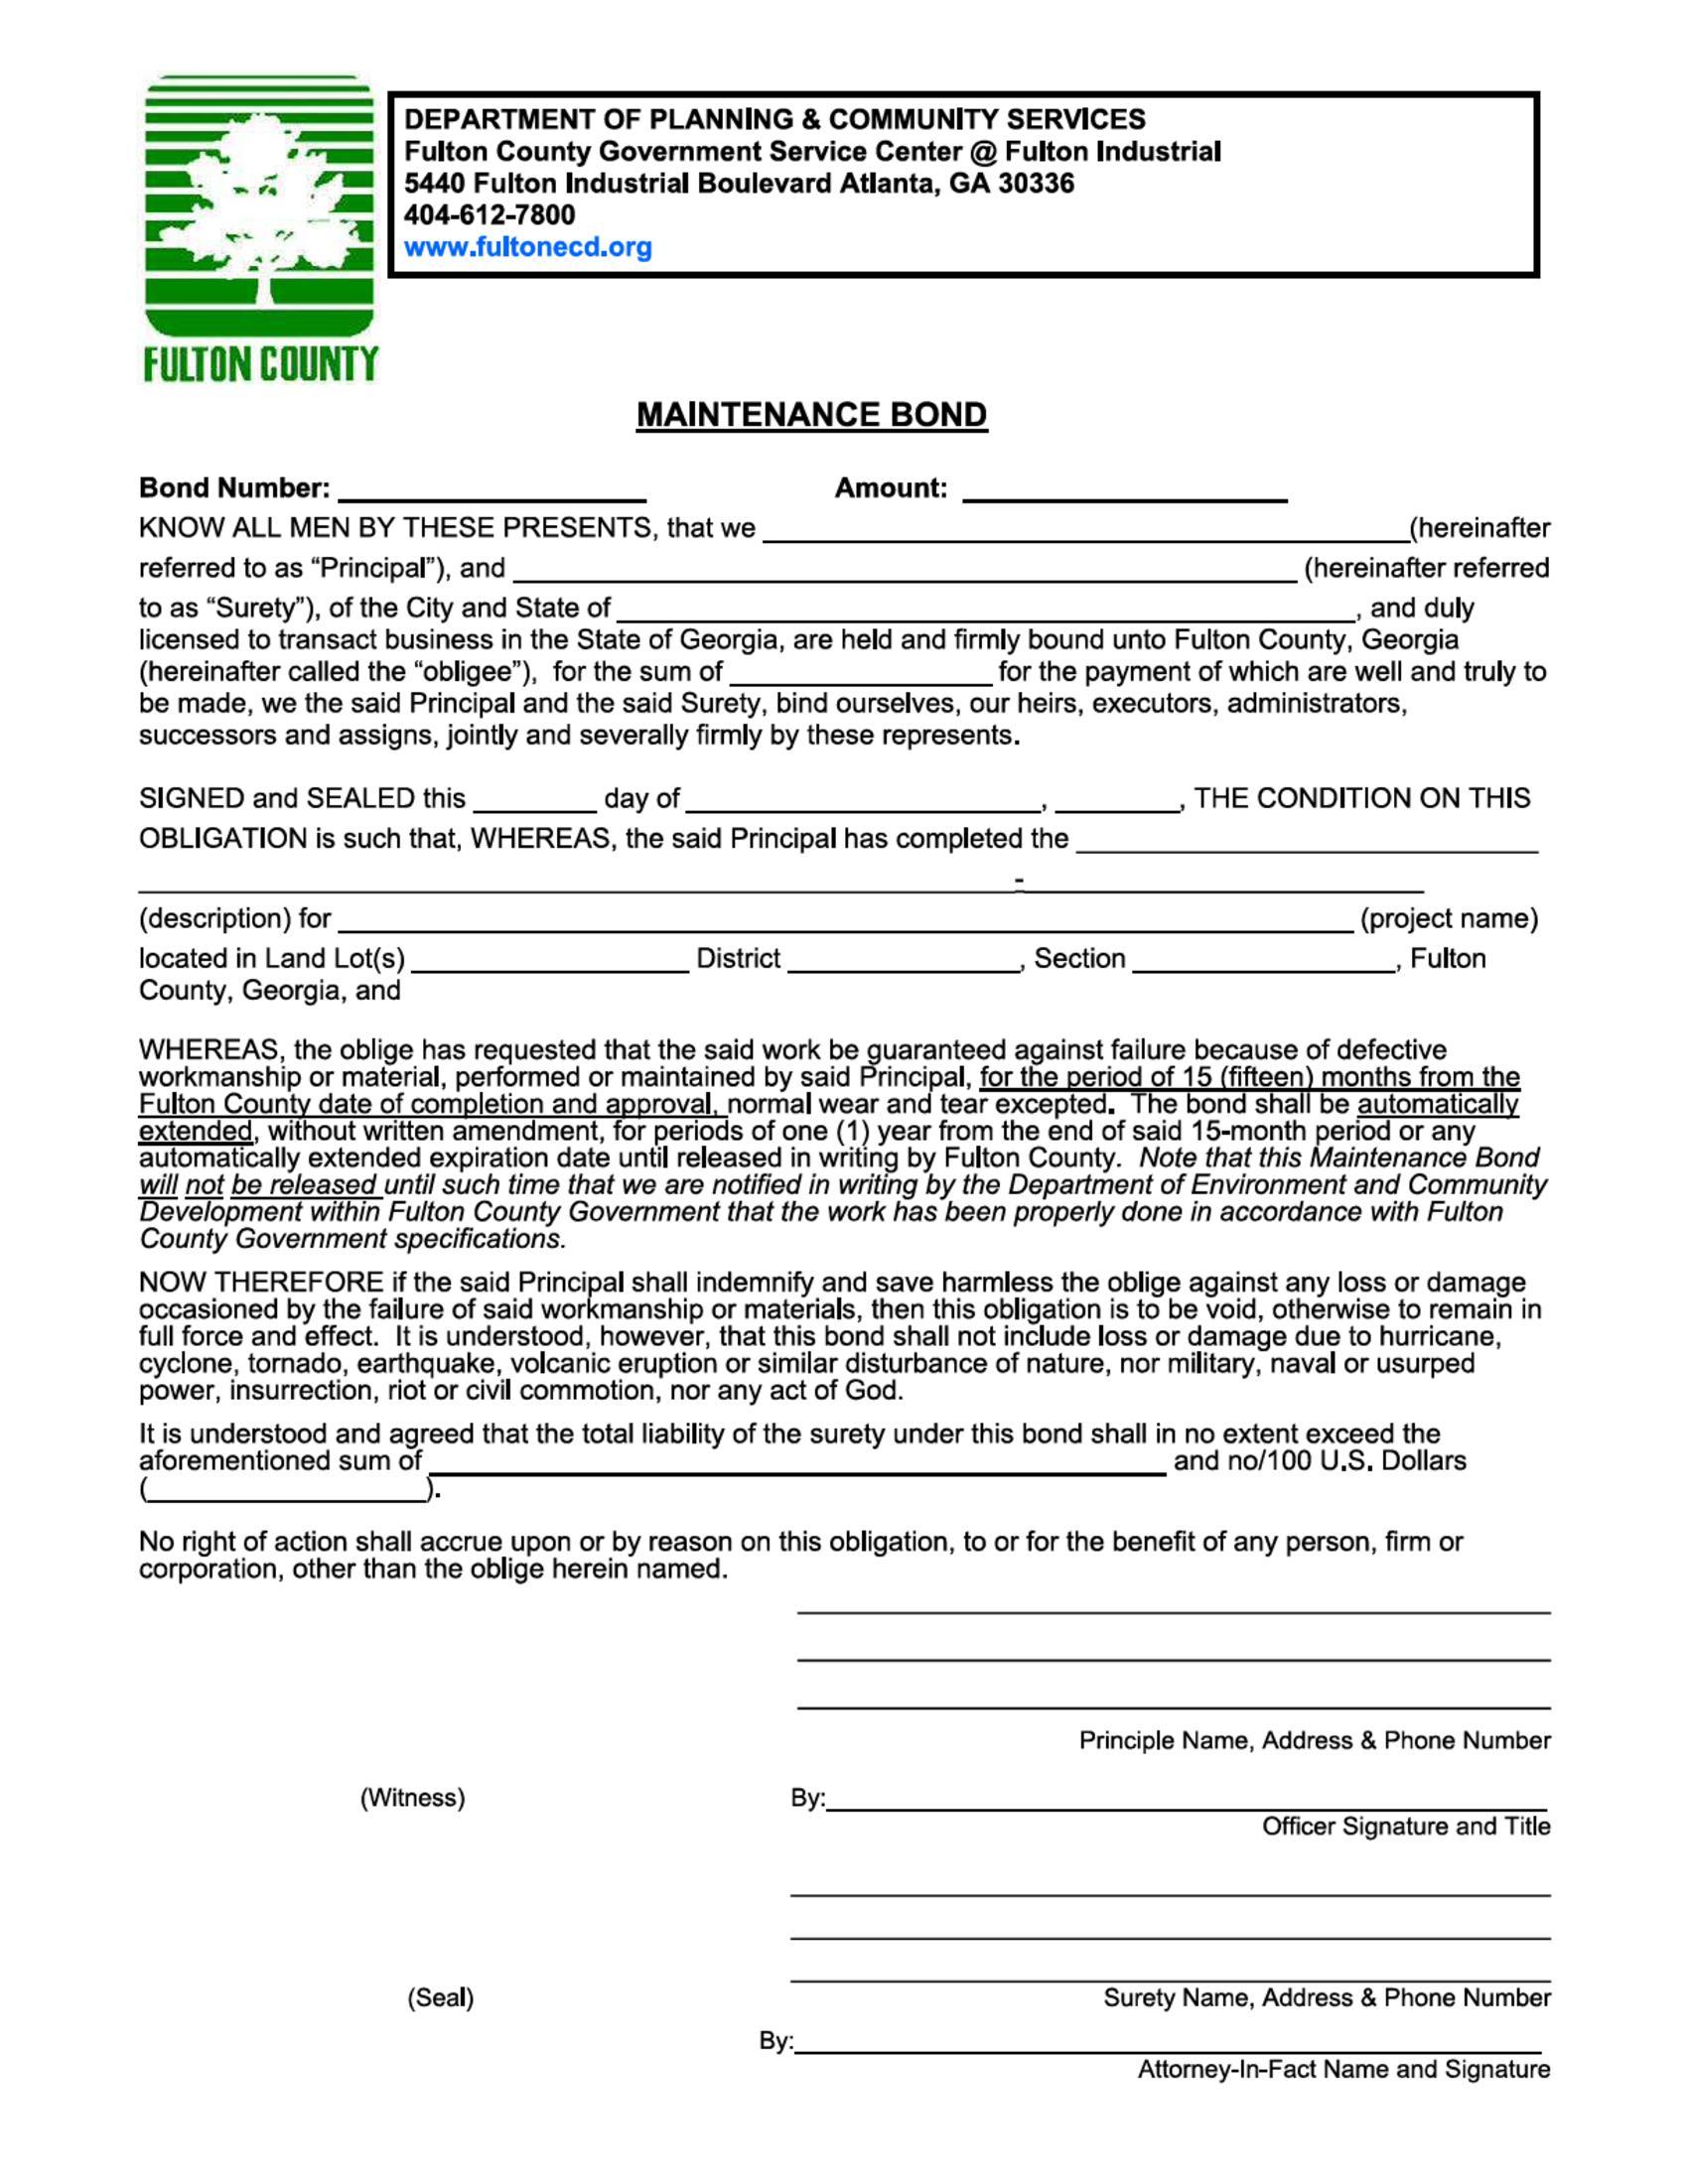 Fulton County Maintenance Bond sample image